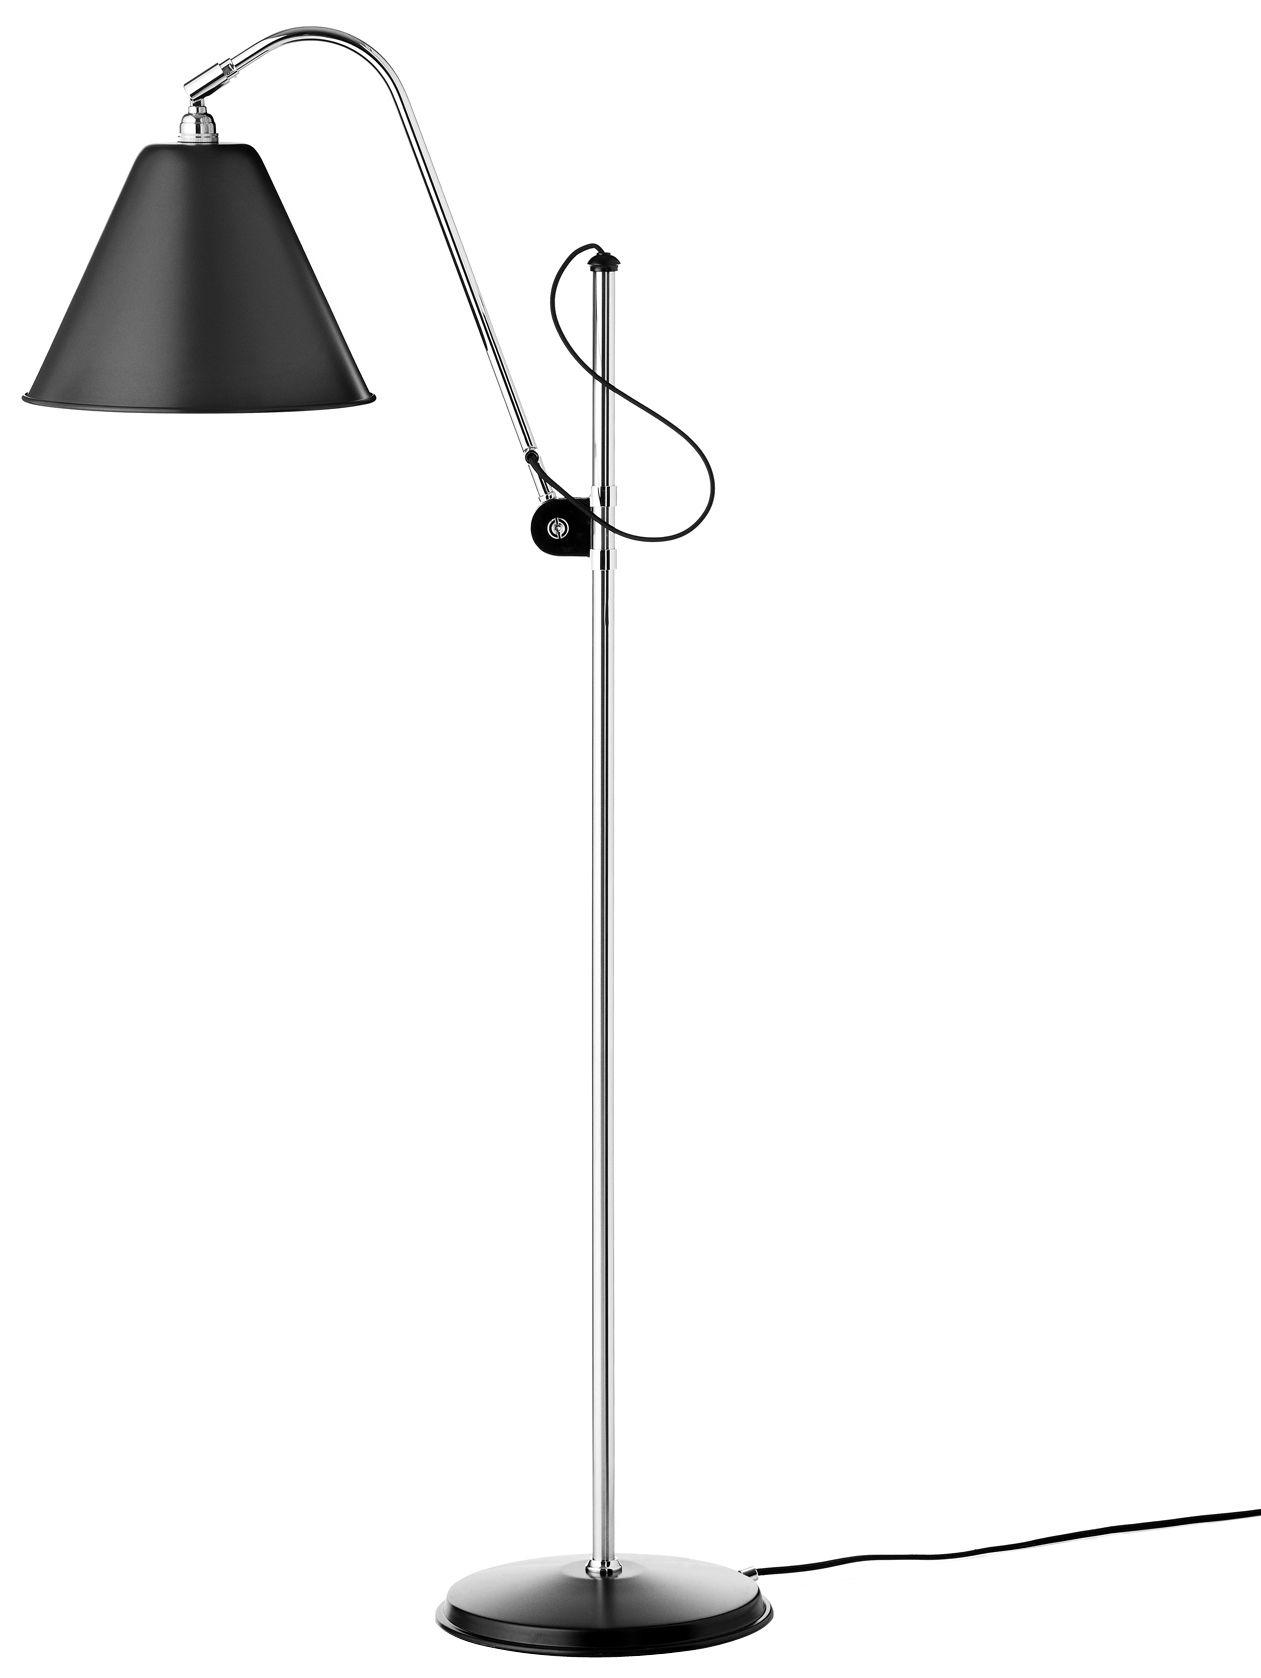 lampadaire bestlite bl3 original r dition de 1930 noir. Black Bedroom Furniture Sets. Home Design Ideas